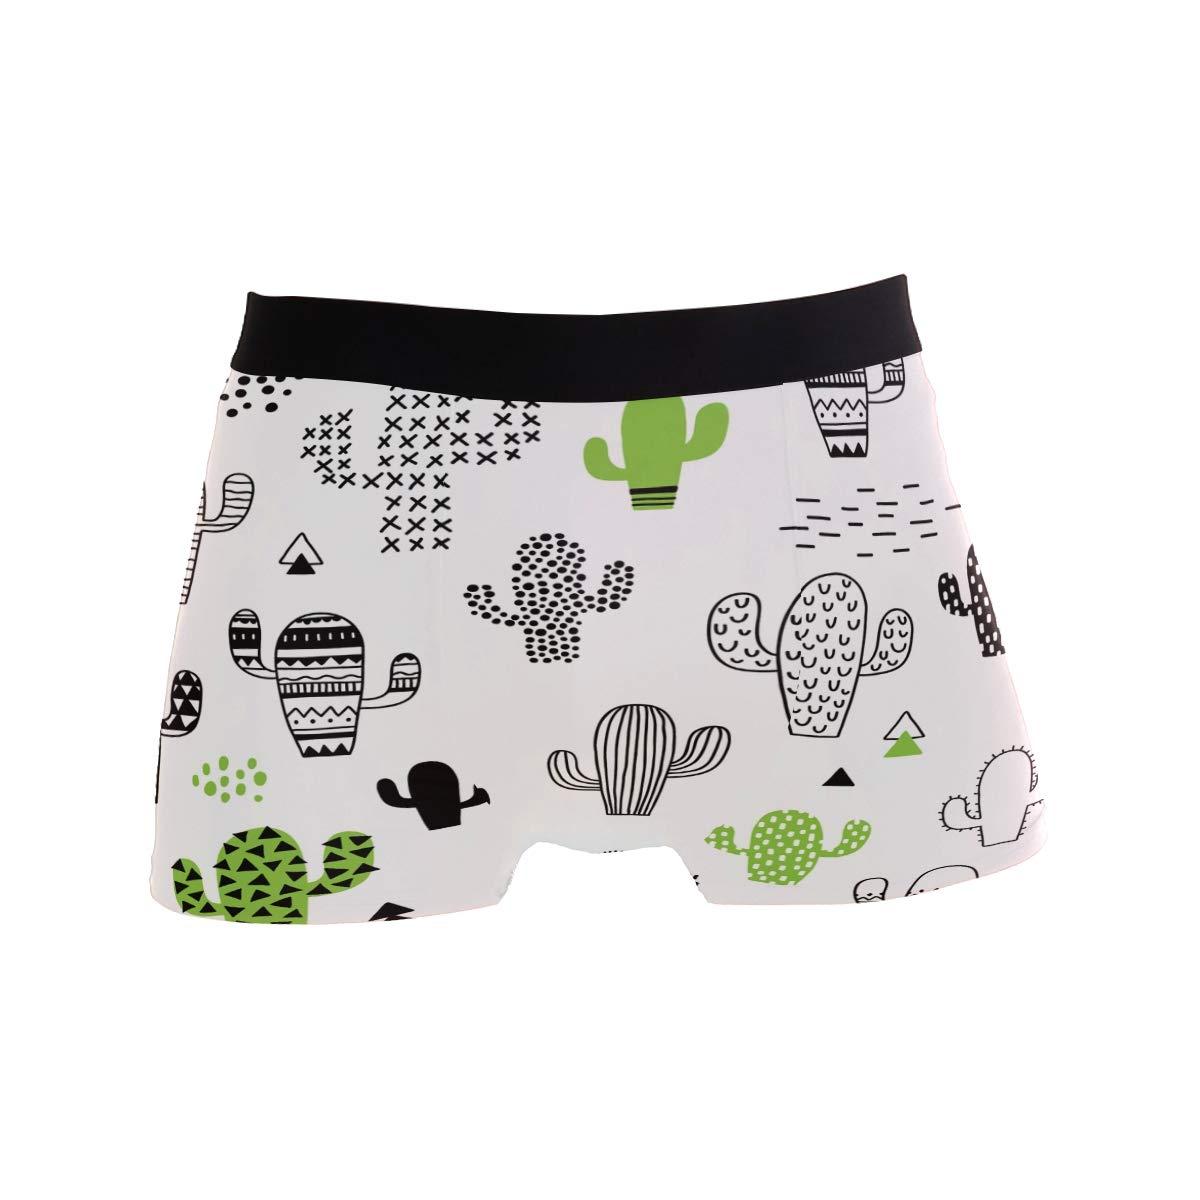 Wamika Cactus Men/'s Boxer Briefs Green Plant Underwear Stretchable S-XL